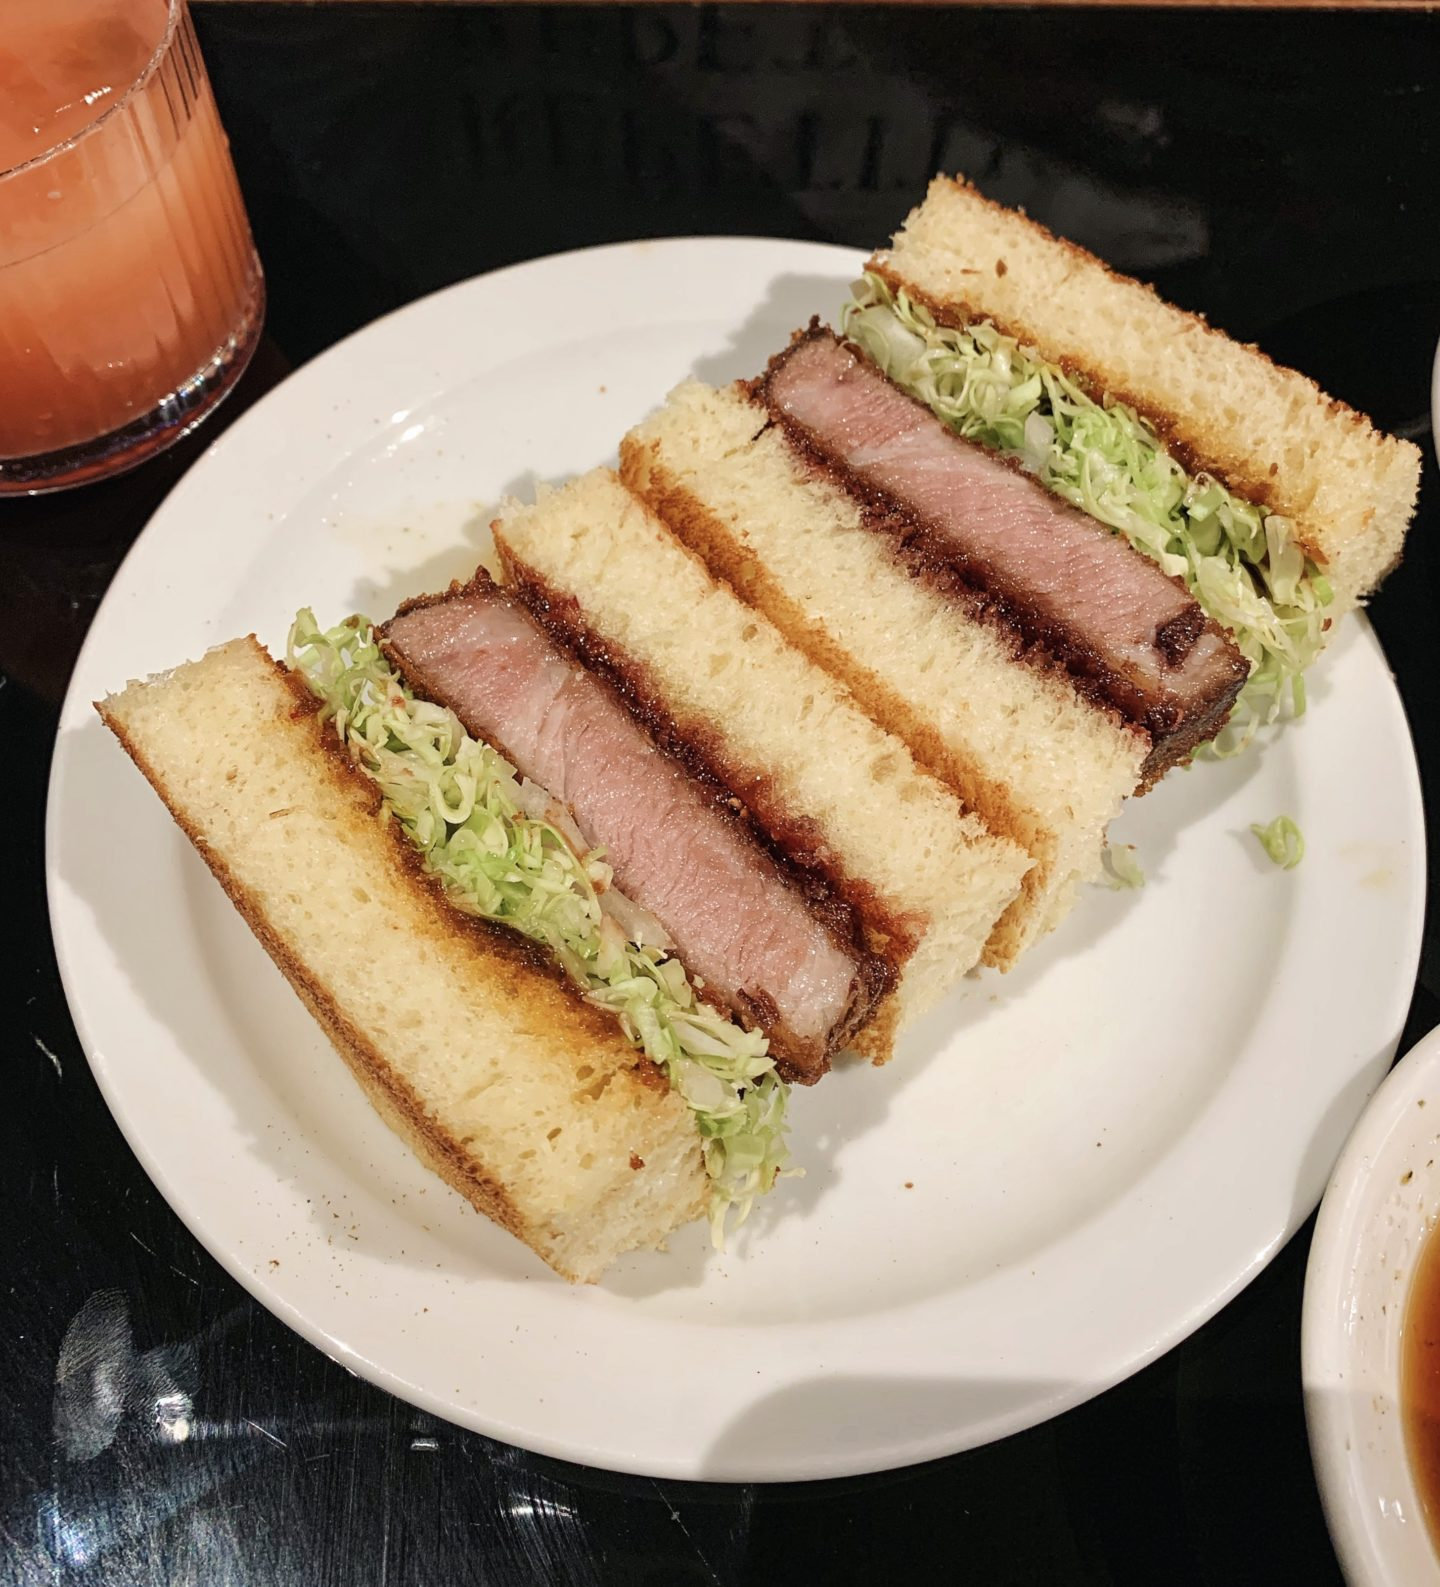 Classic katsu sandwich served sliced on a plate